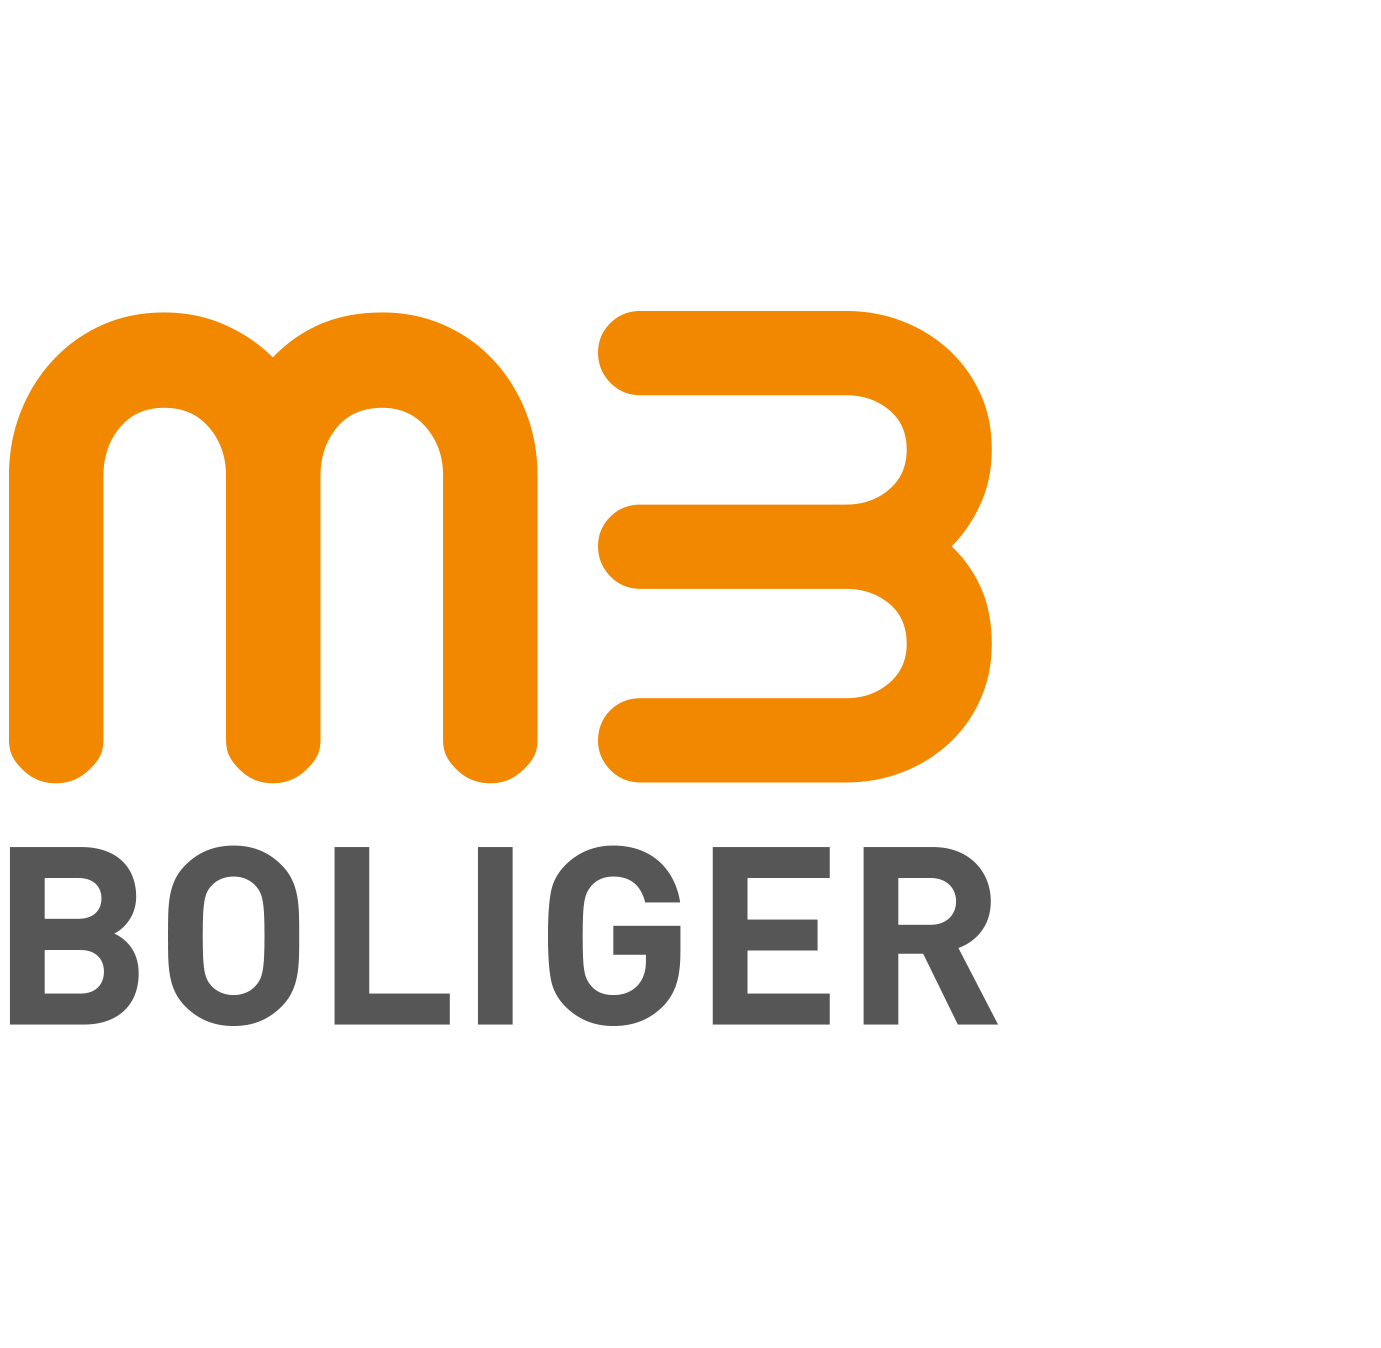 M3 Boliger